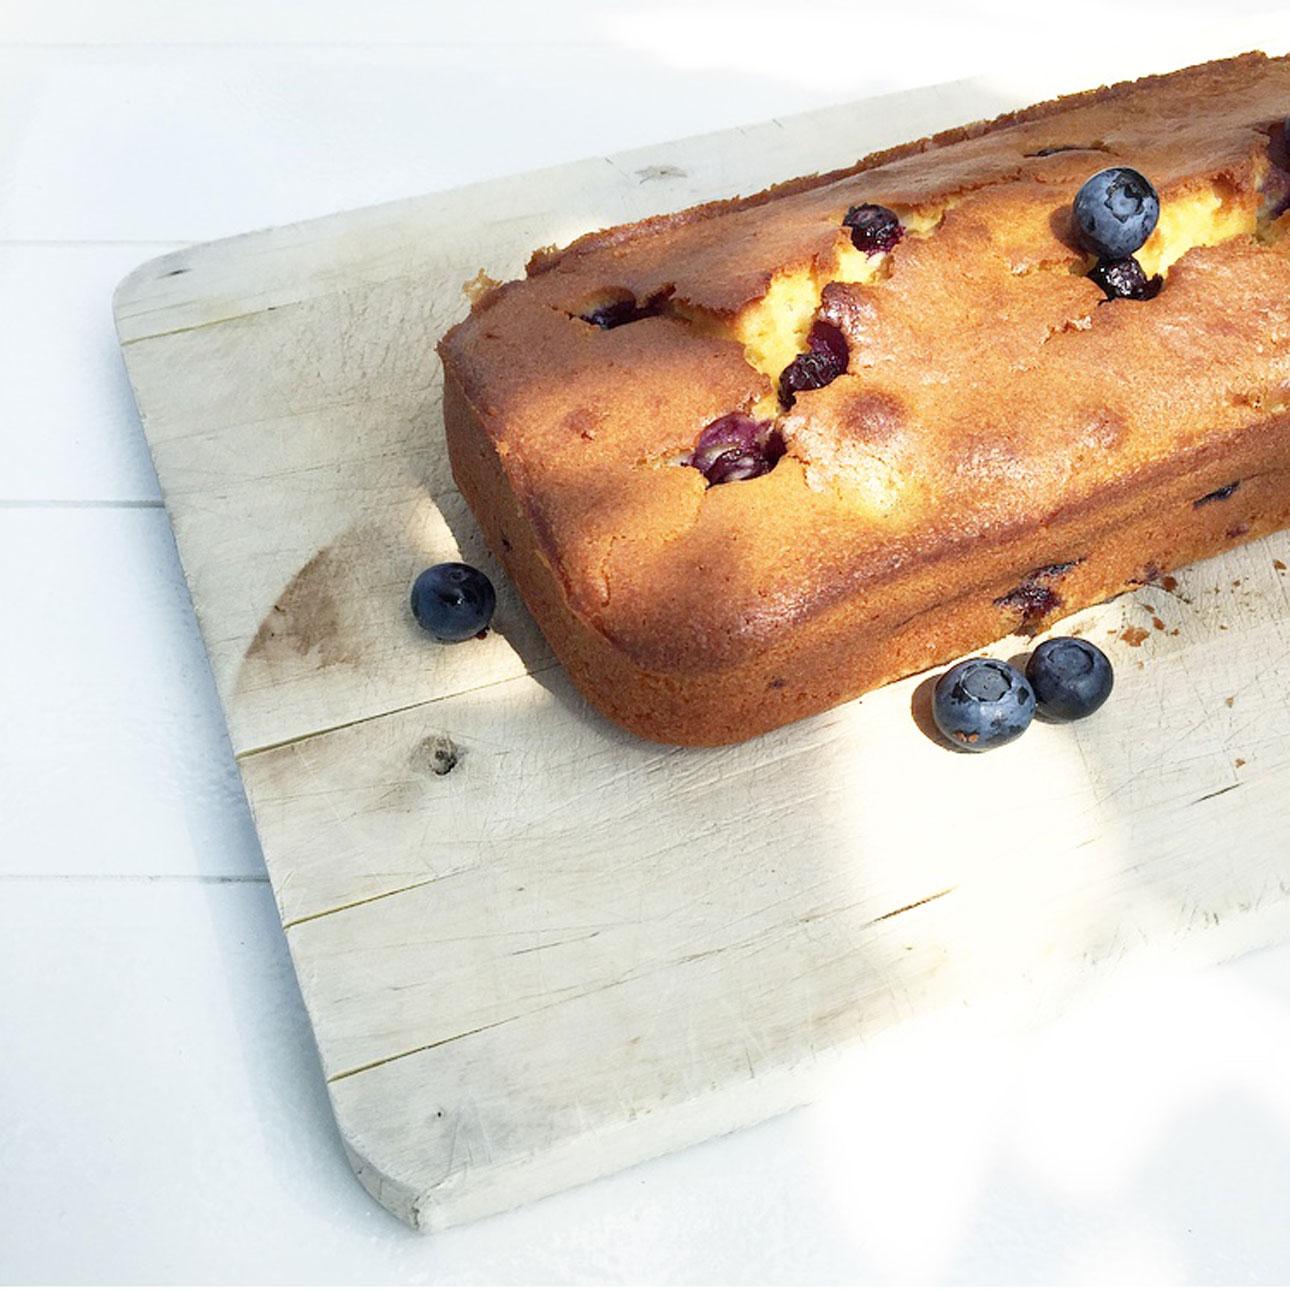 mamalifestyle juli 2015 14 cake bakken - blueberry yoghurt cake Donna Hay